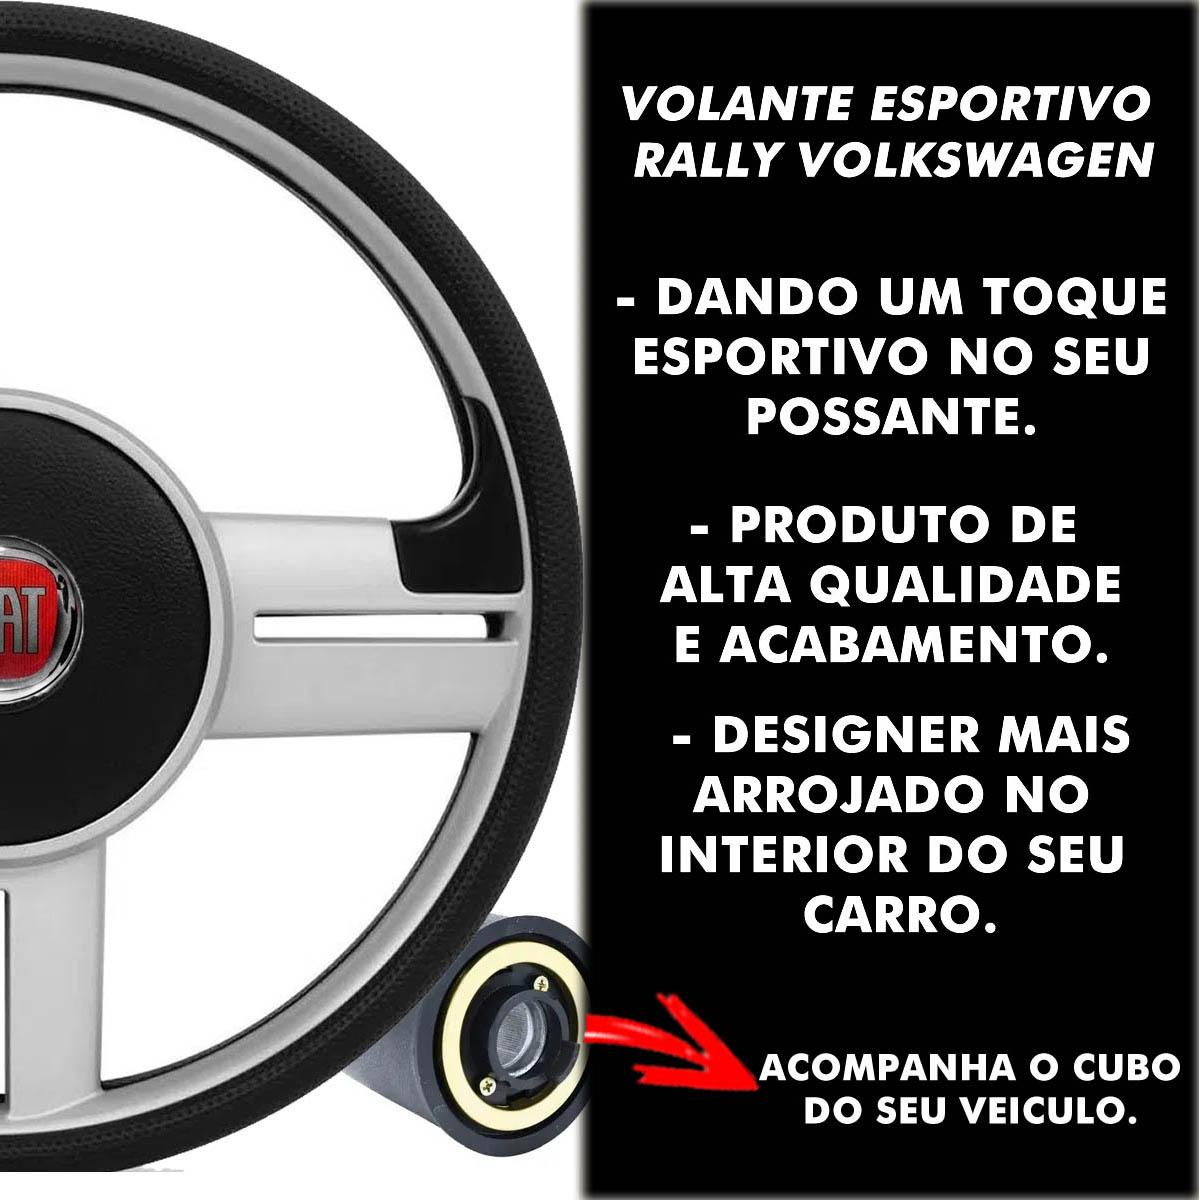 Volante Fiat Surf Rallye Esportivo Cubo Palio Uno 1983 a 2013 Strada Siena Punto Idea Stilo Poliparts